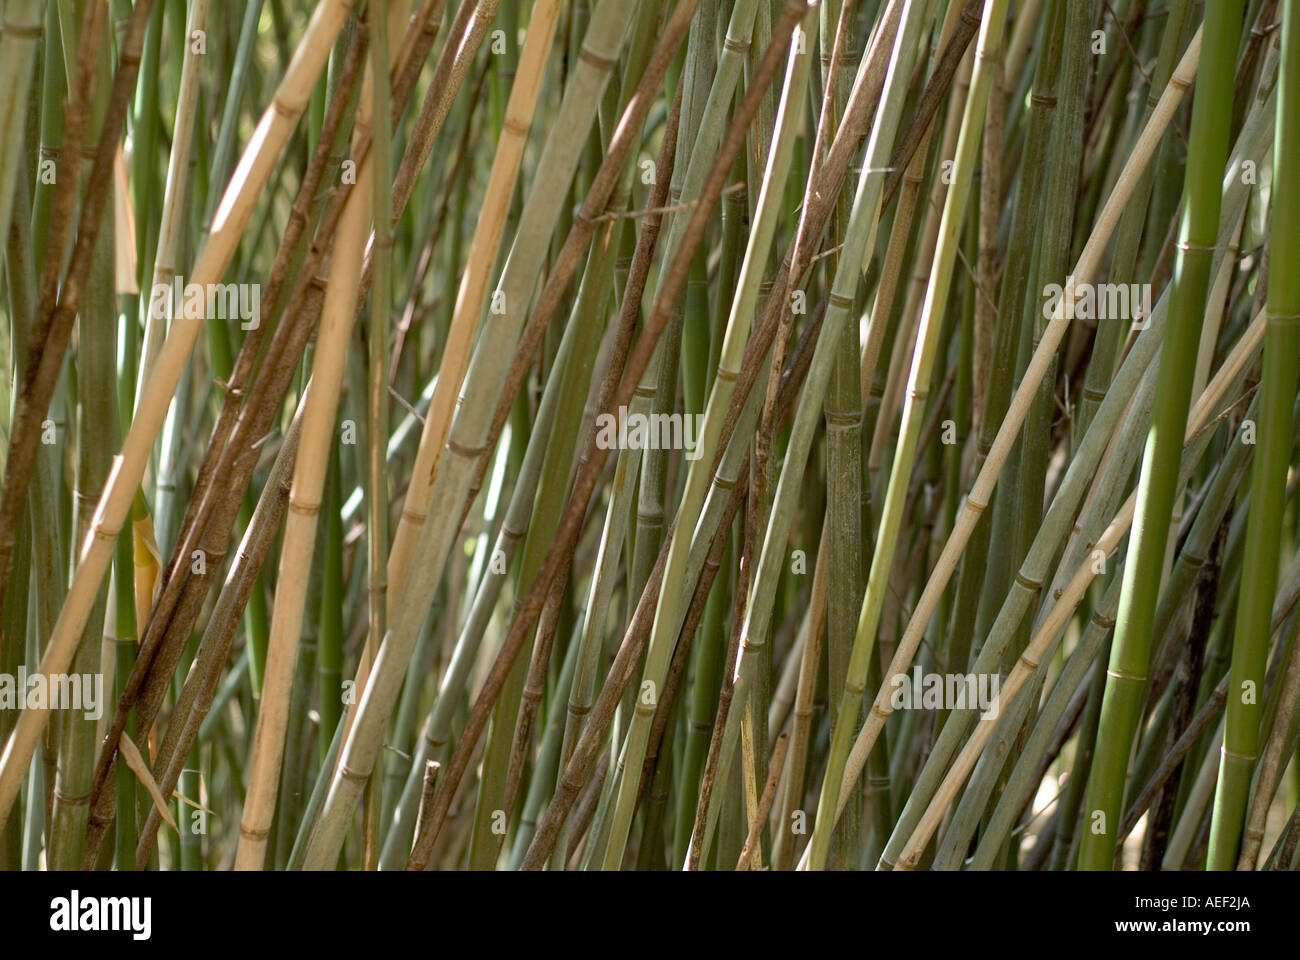 Bambus Cluster Dichten Dicken Wachstum Stockfoto Bild 7808169 Alamy